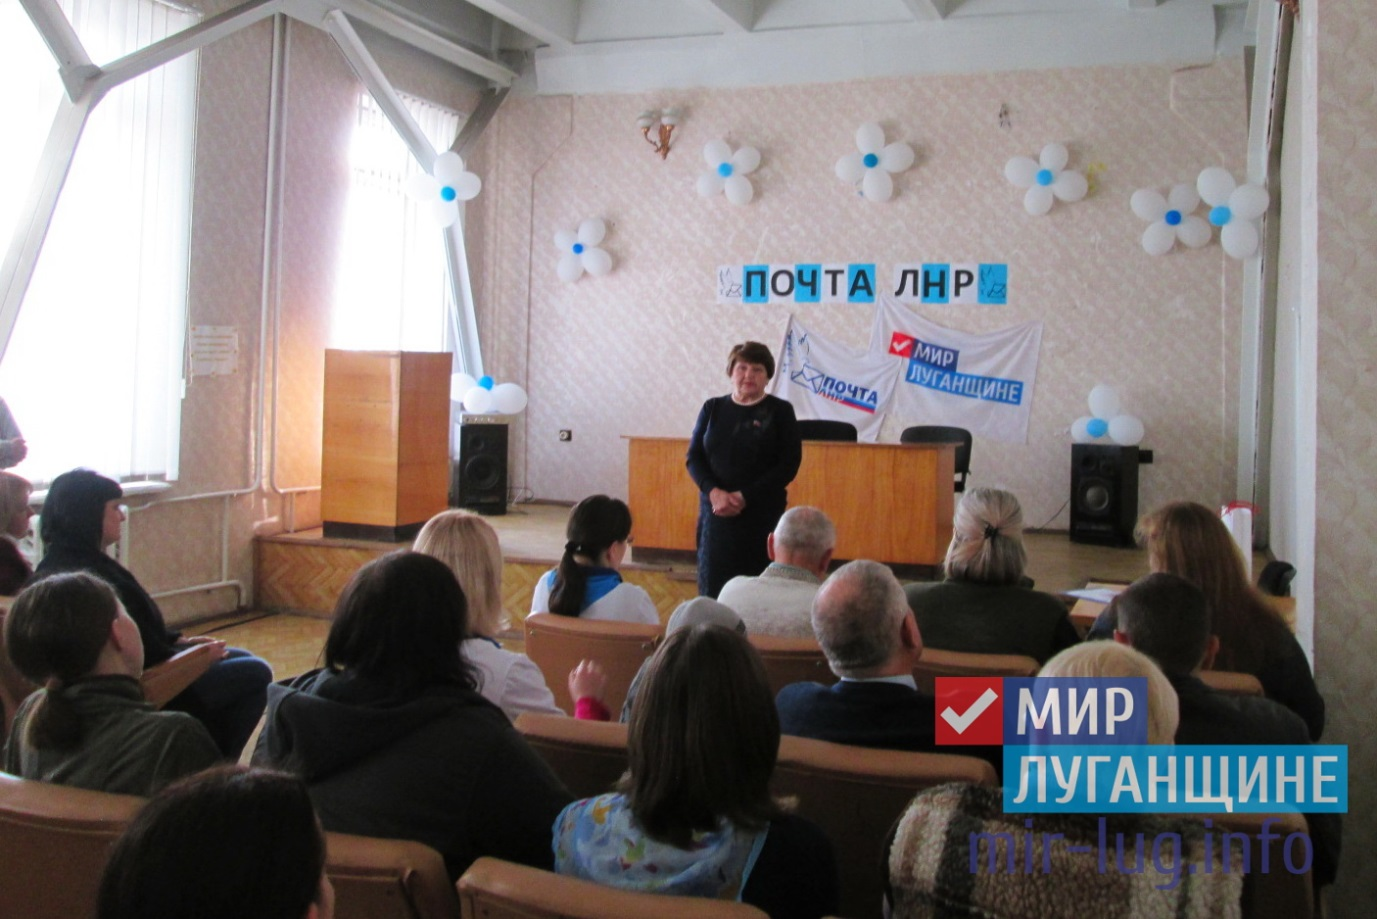 Депутат Народного совета ЛНР Елена Рахмукова встретилась с жителями Антрацита 3